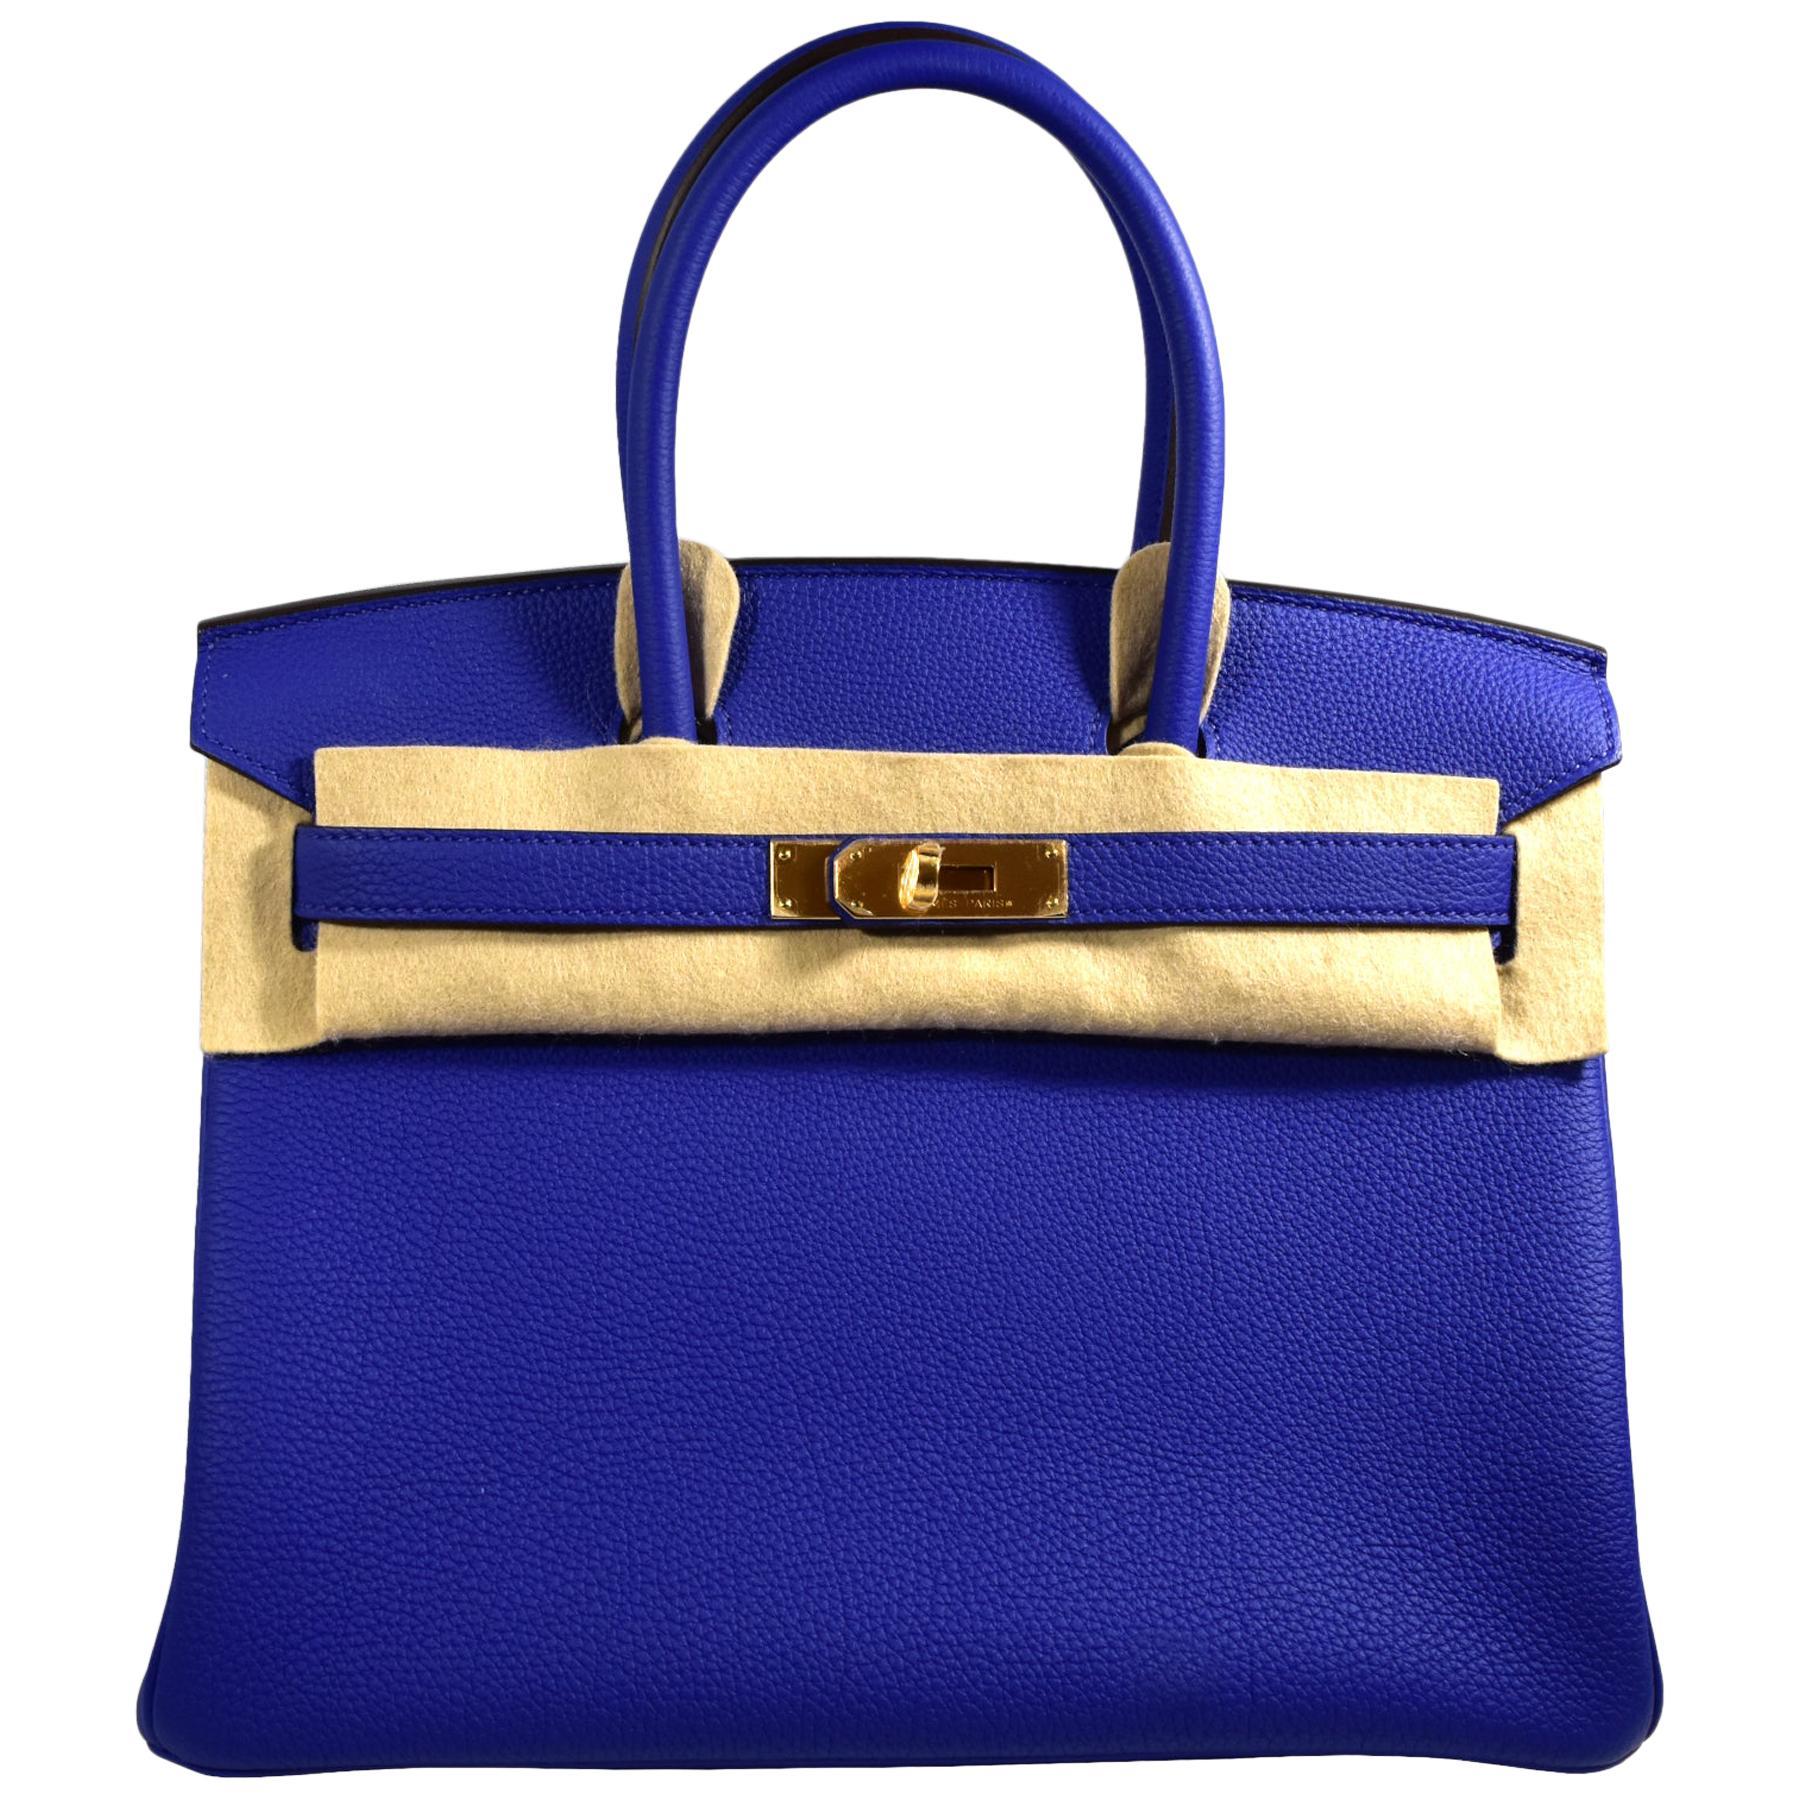 Hermes Birkin Electric Blue Gold Hardware Handbag